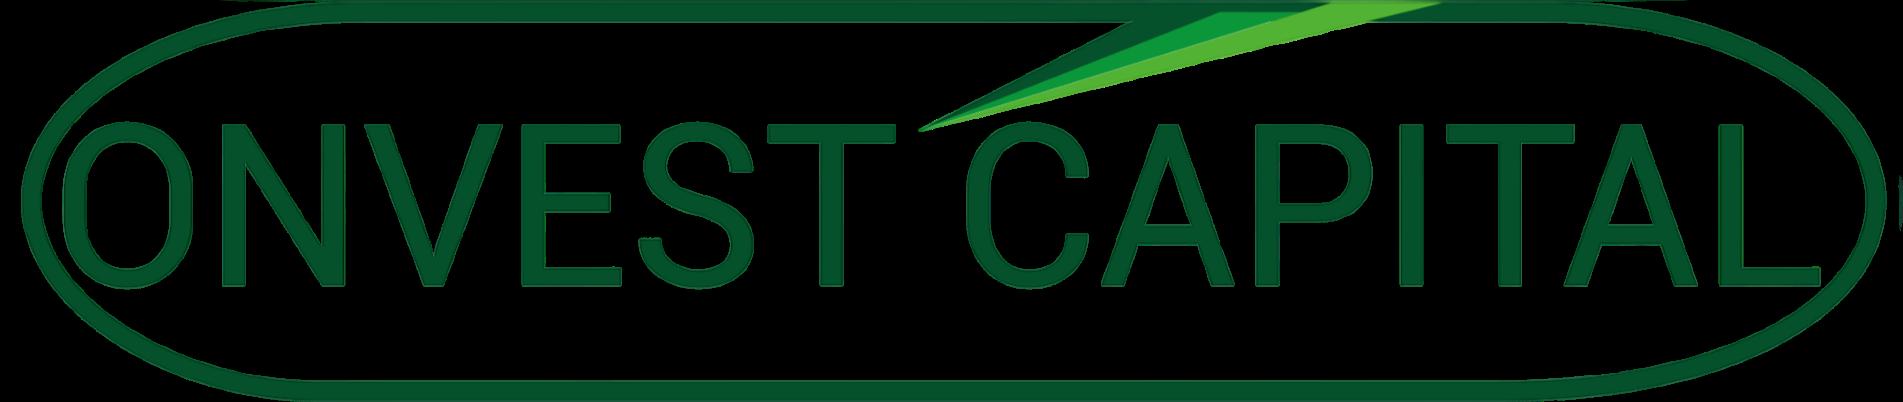 Onvest Capital Logo Transparent